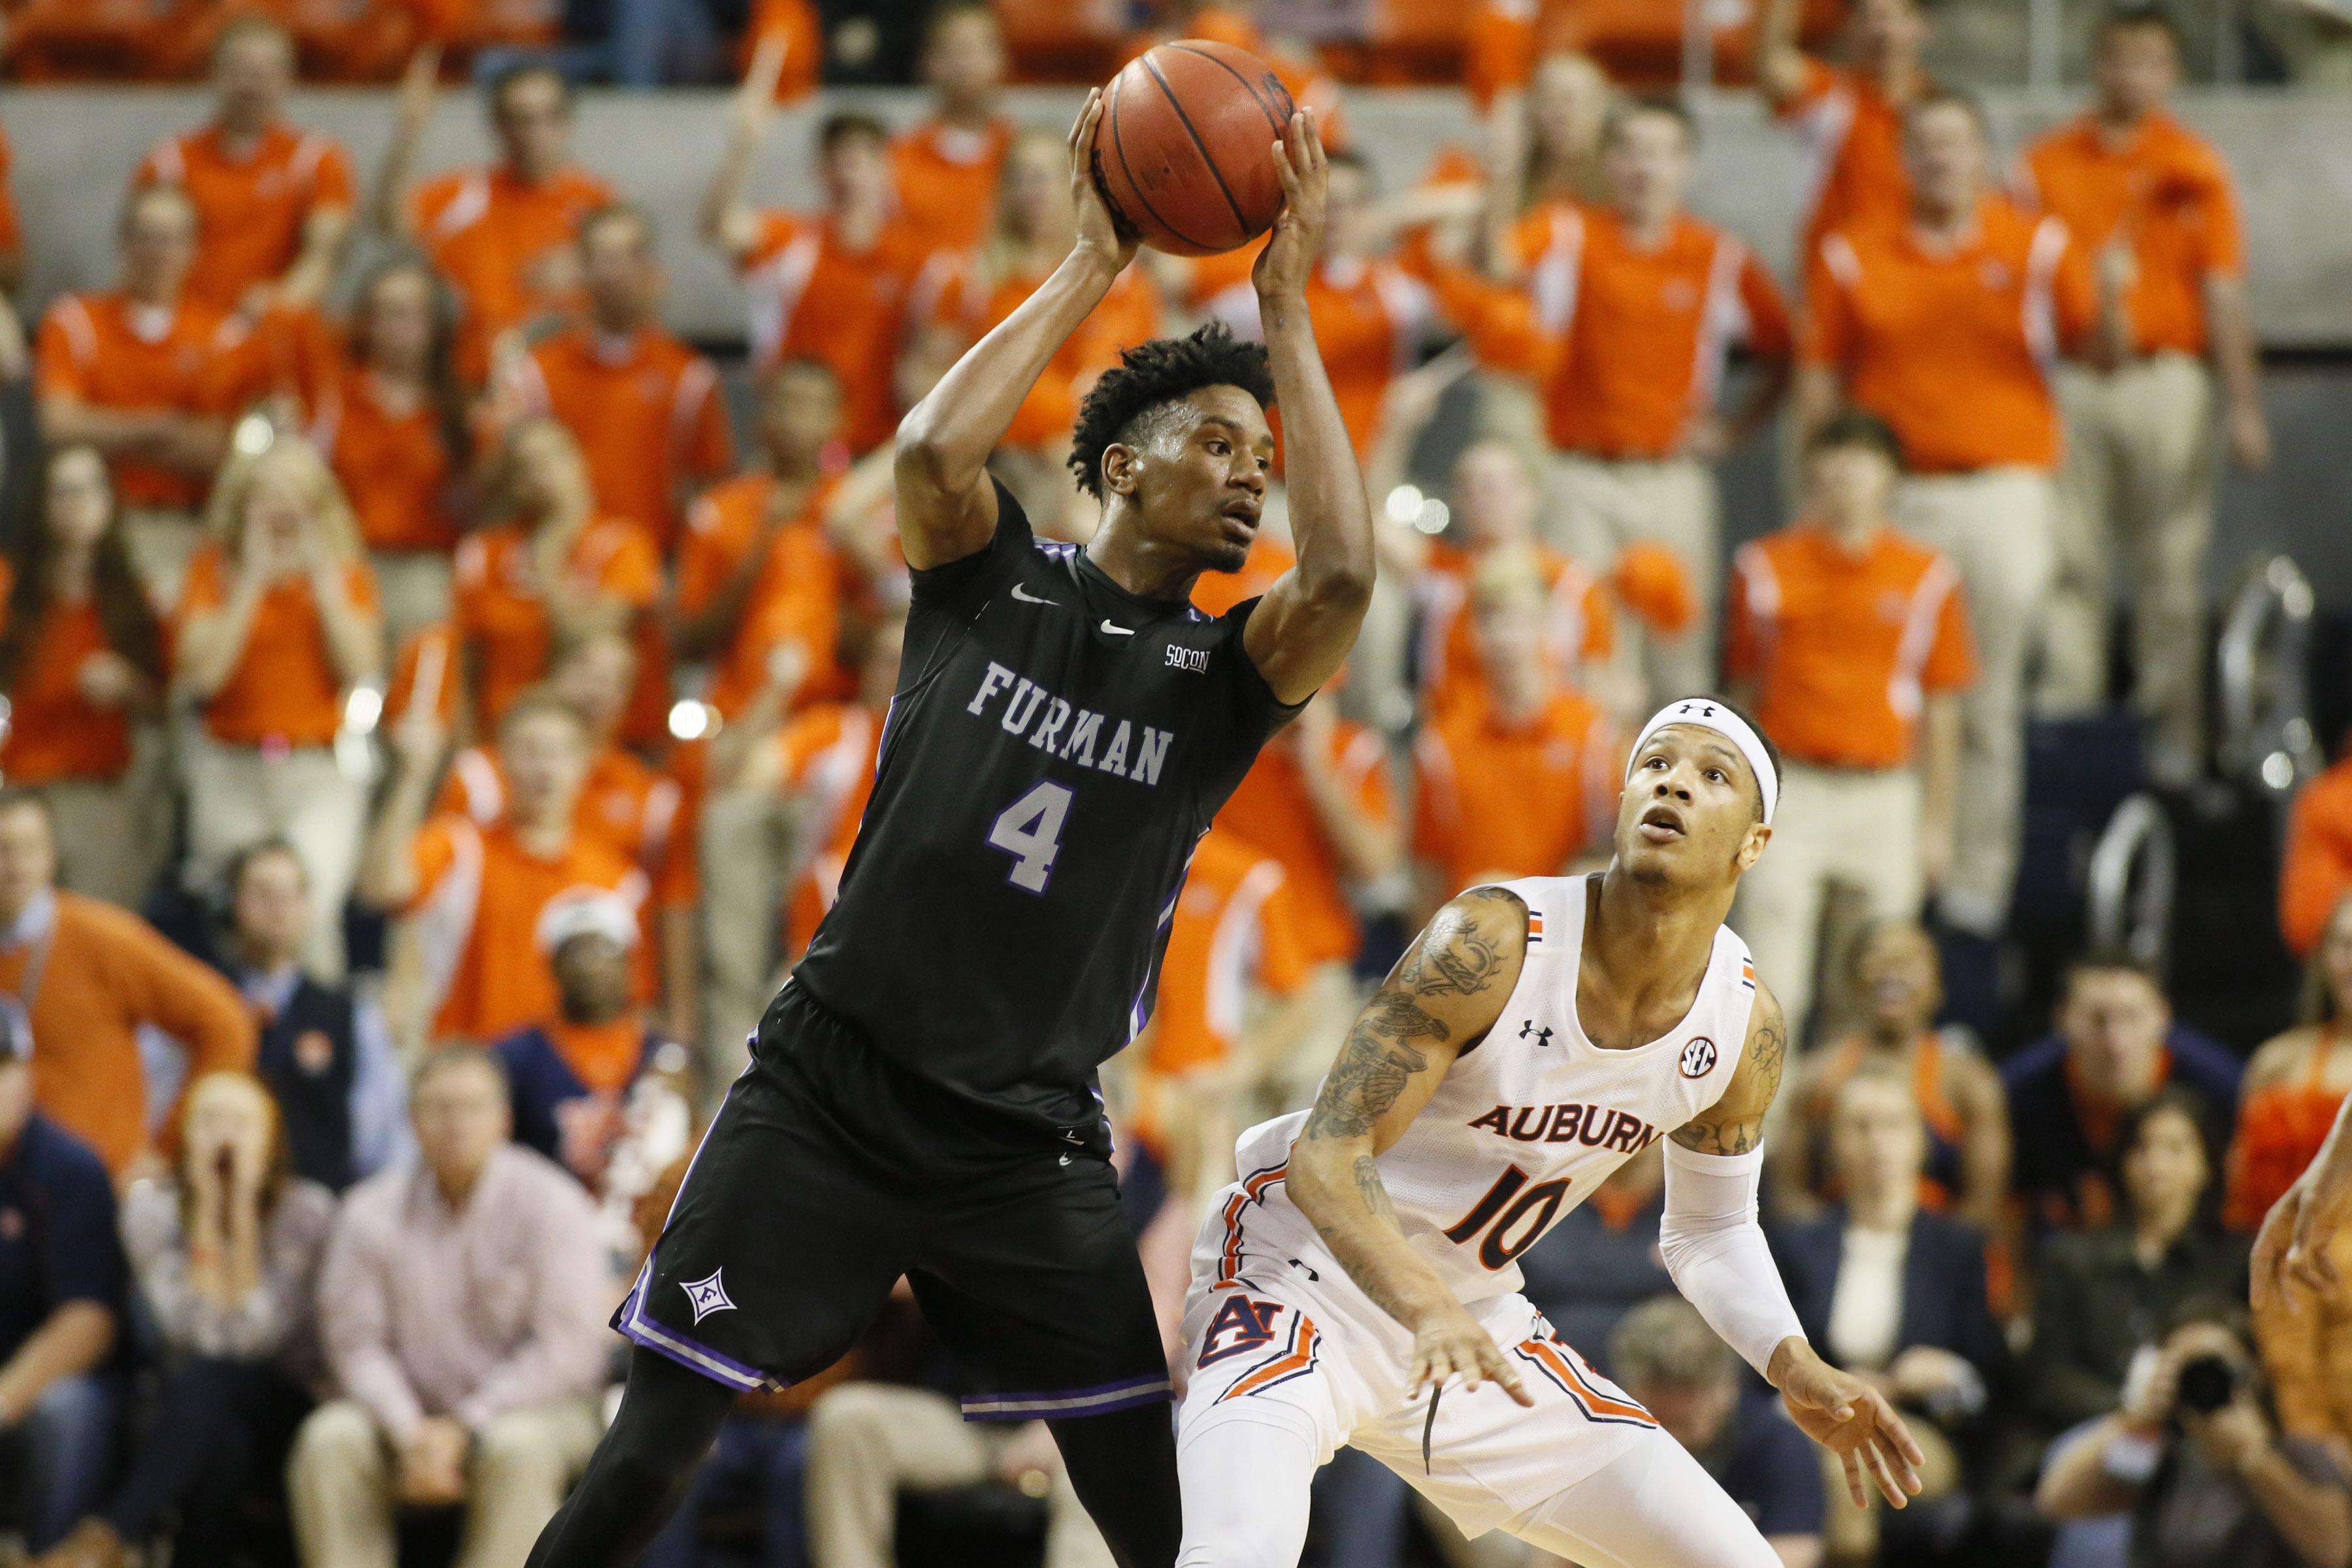 NCAA Basketball: Furman at Auburn